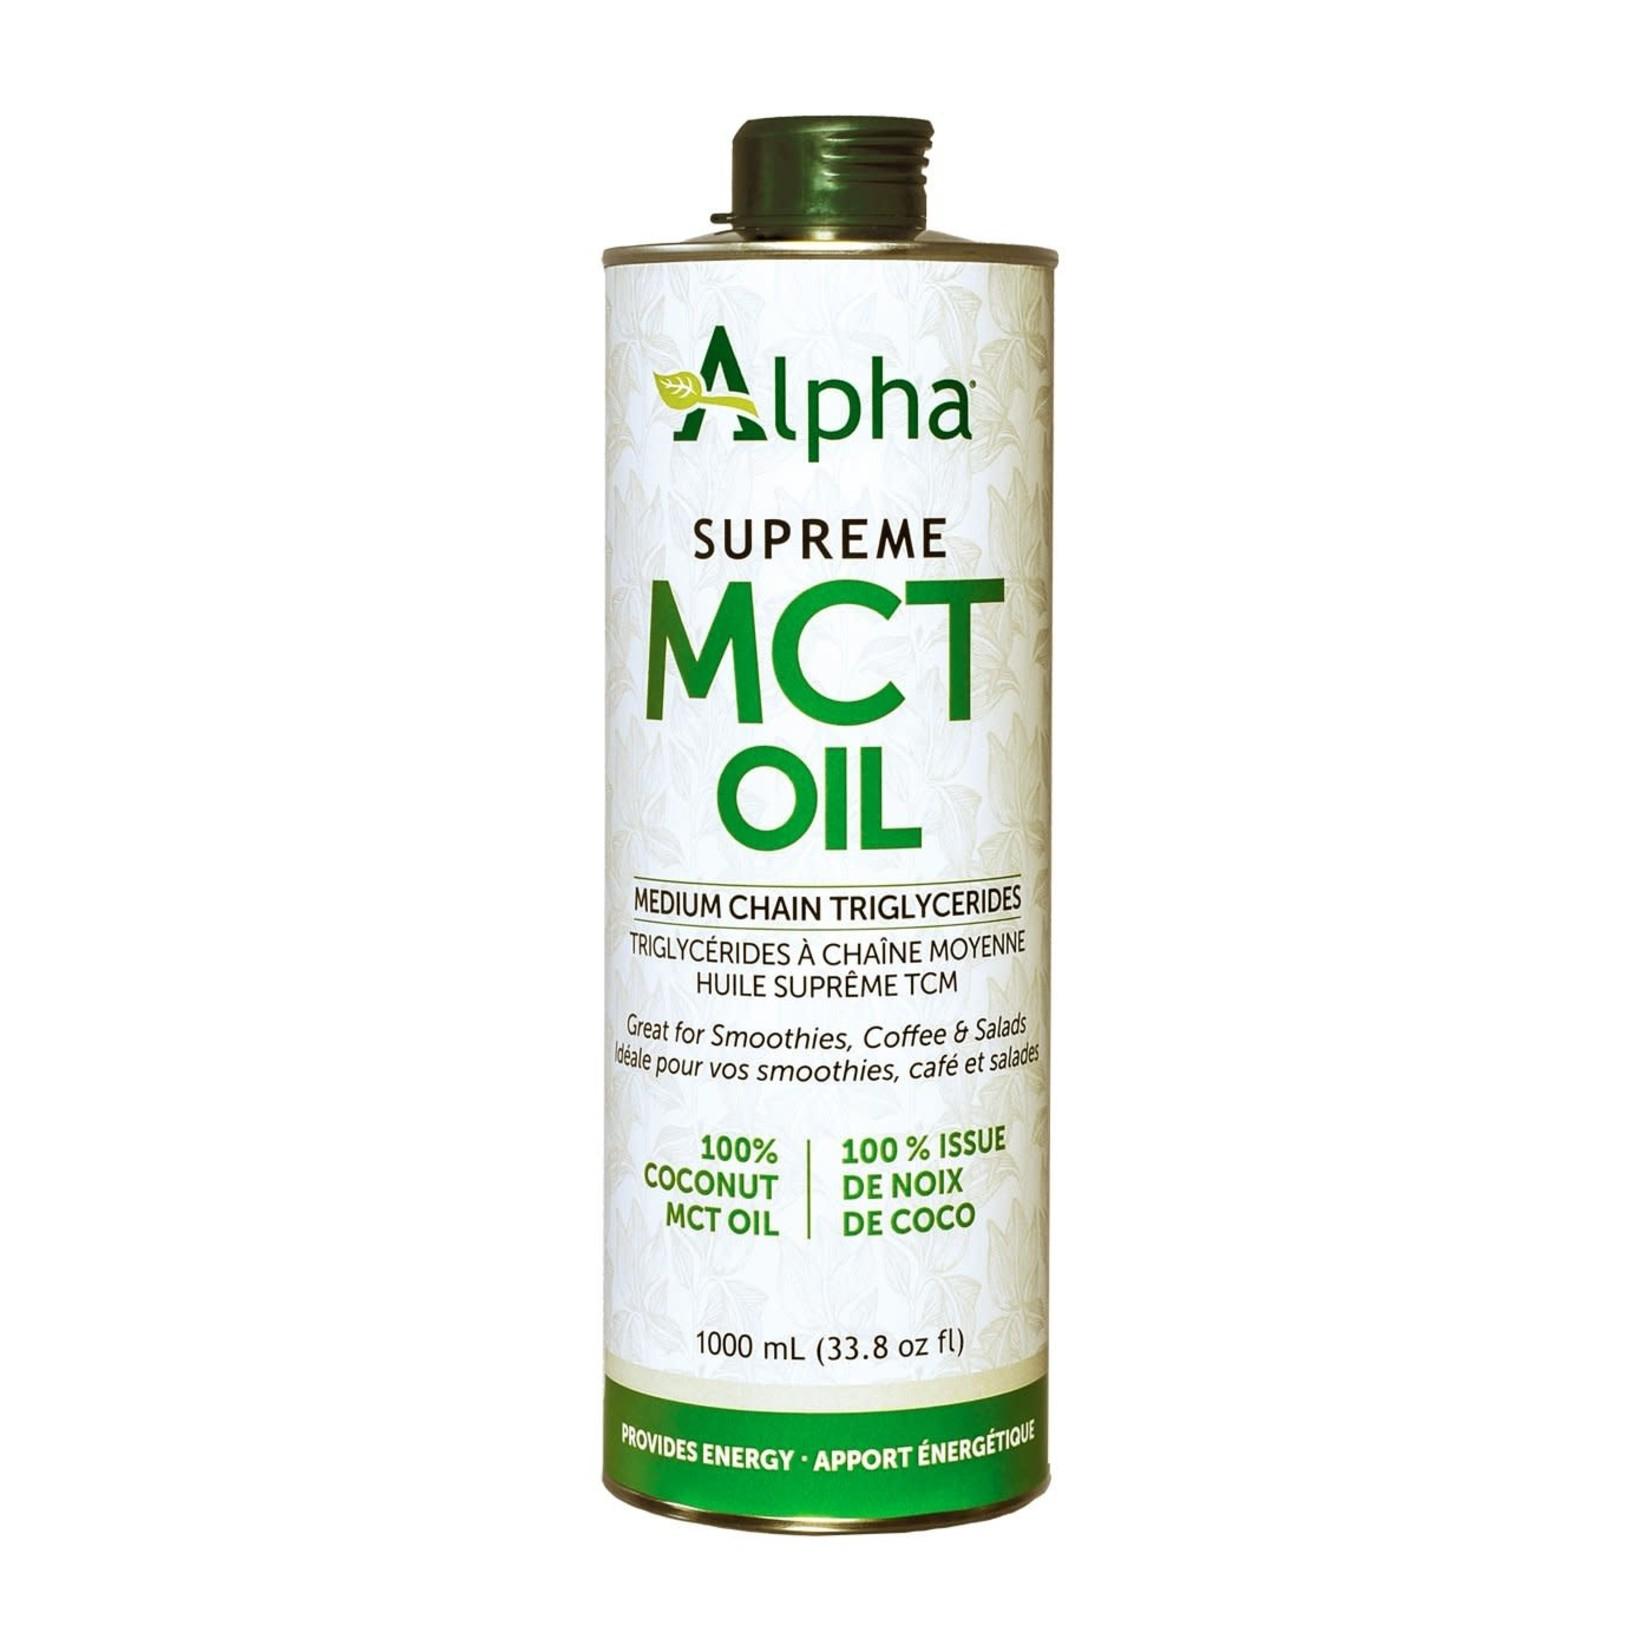 Alpha Alpha Supreme MCT Oil 1000ml